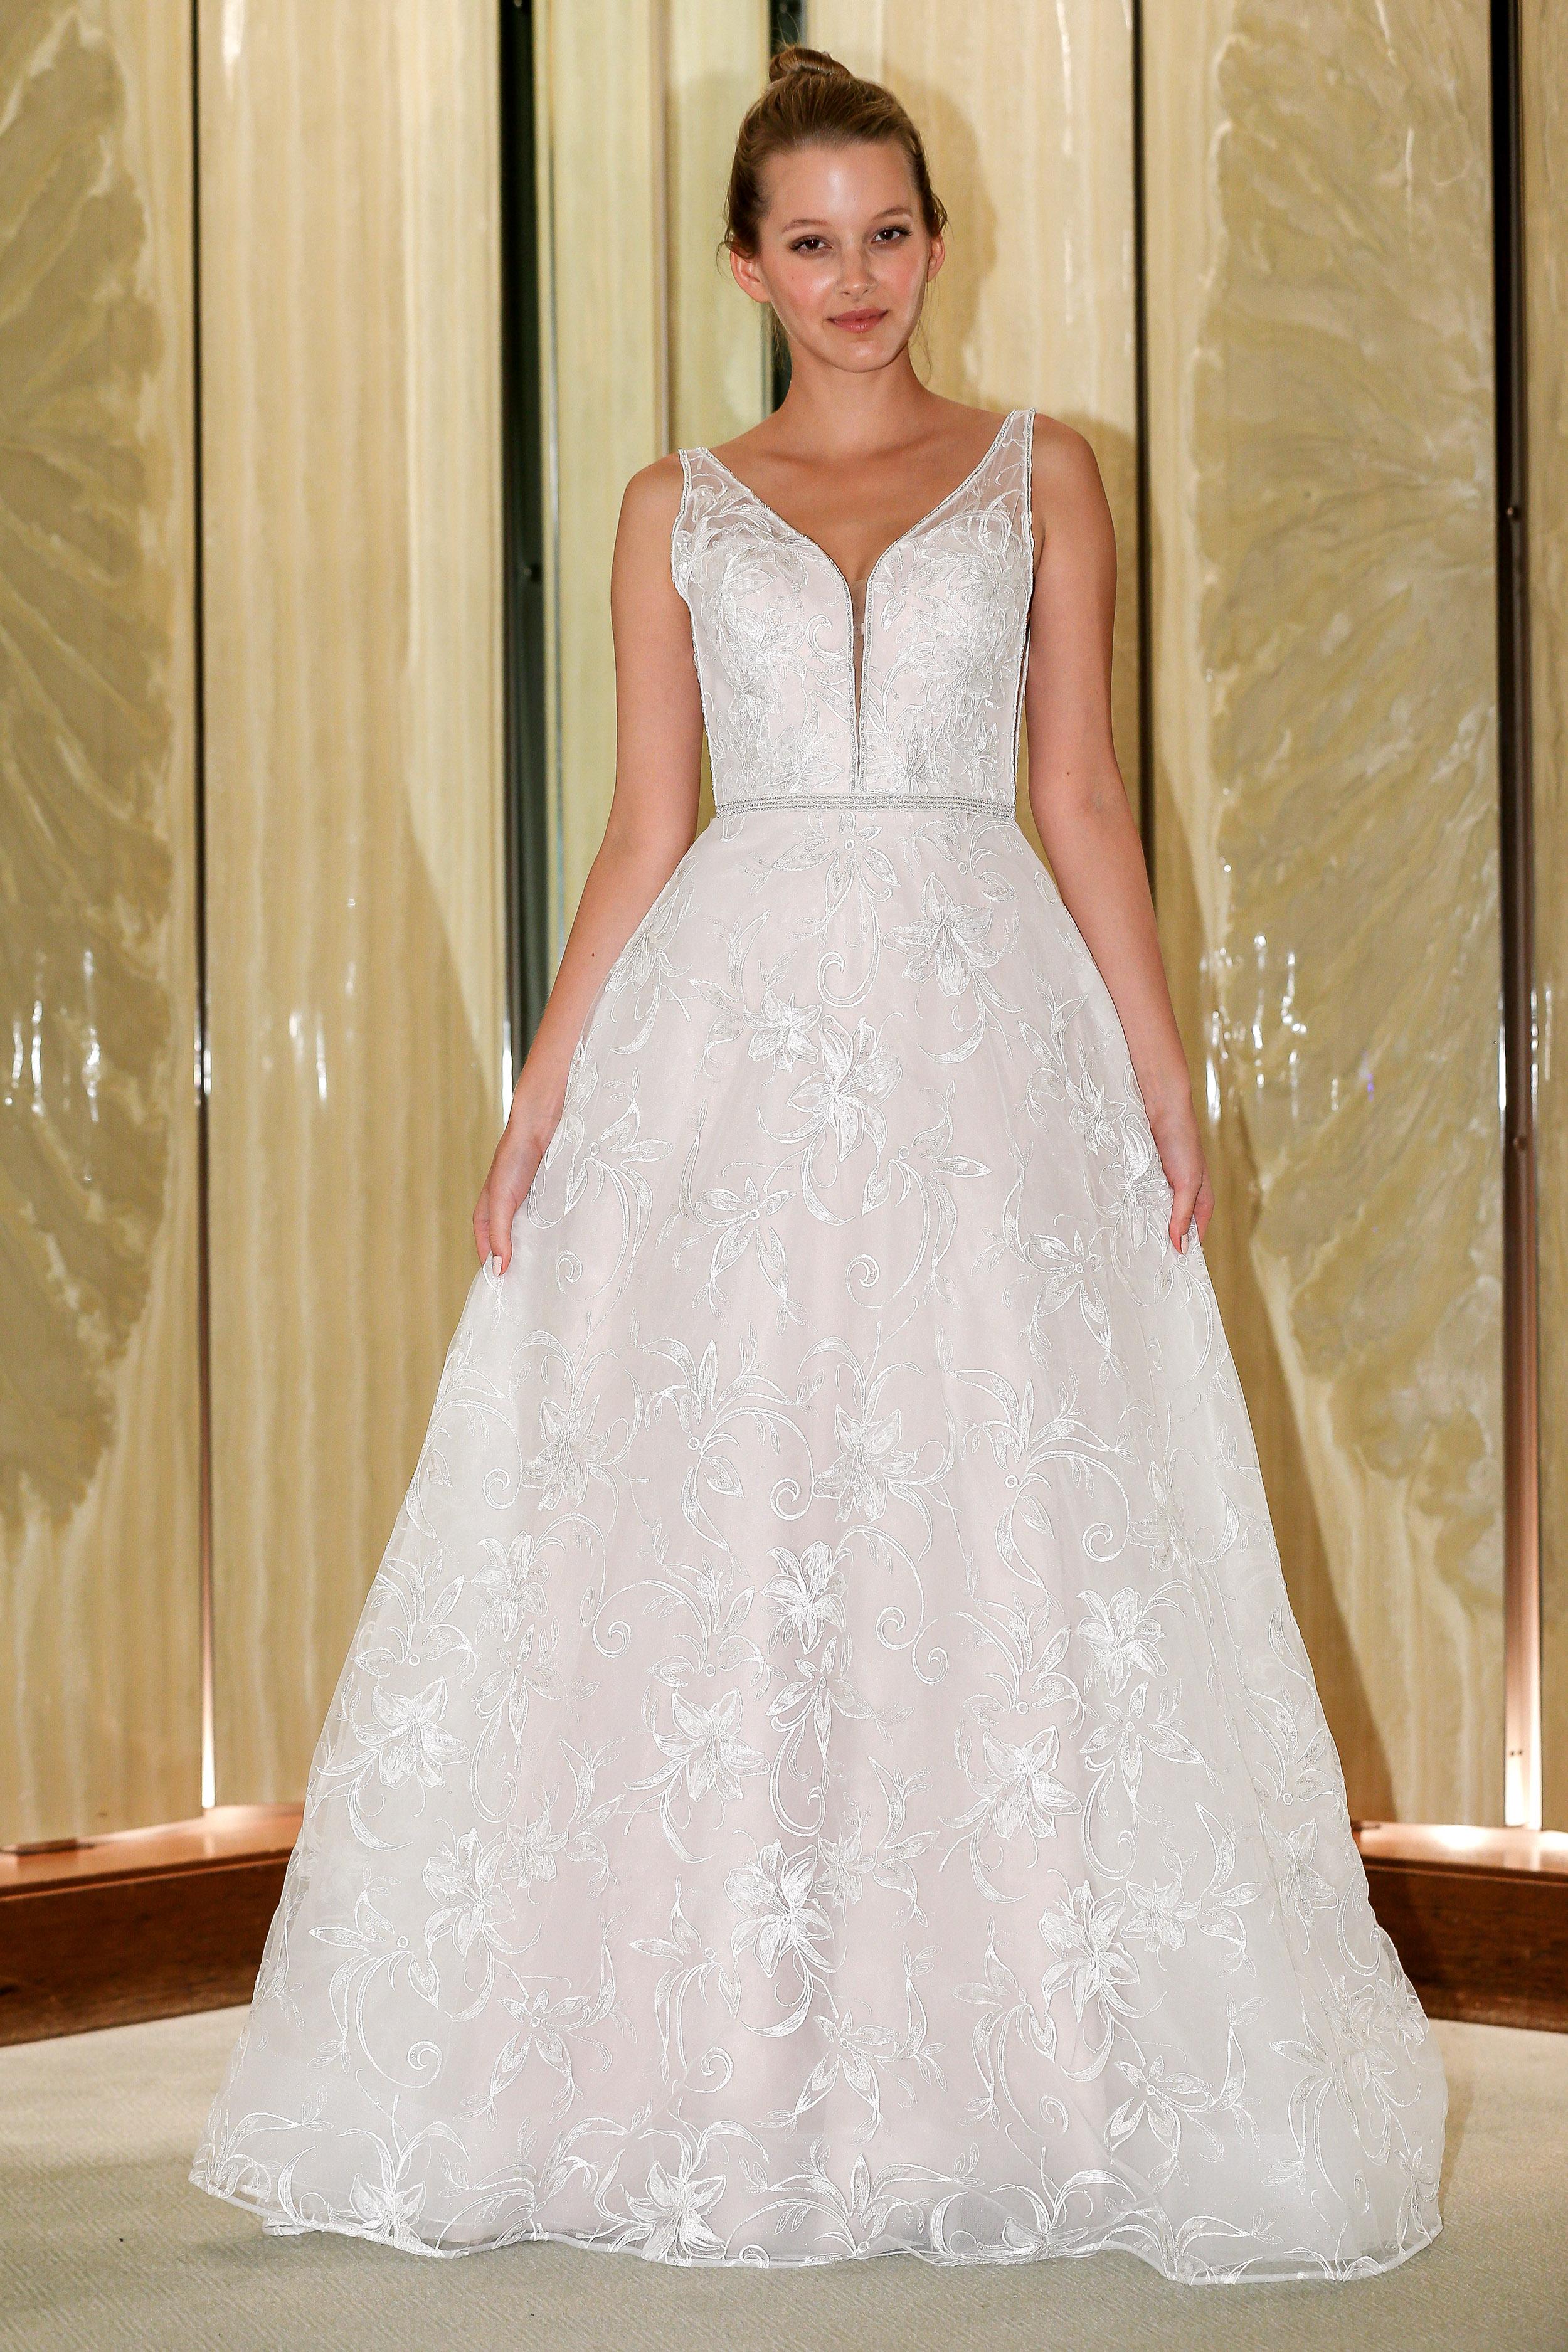 randy fenoli wedding dress floral applique v-neck a-line